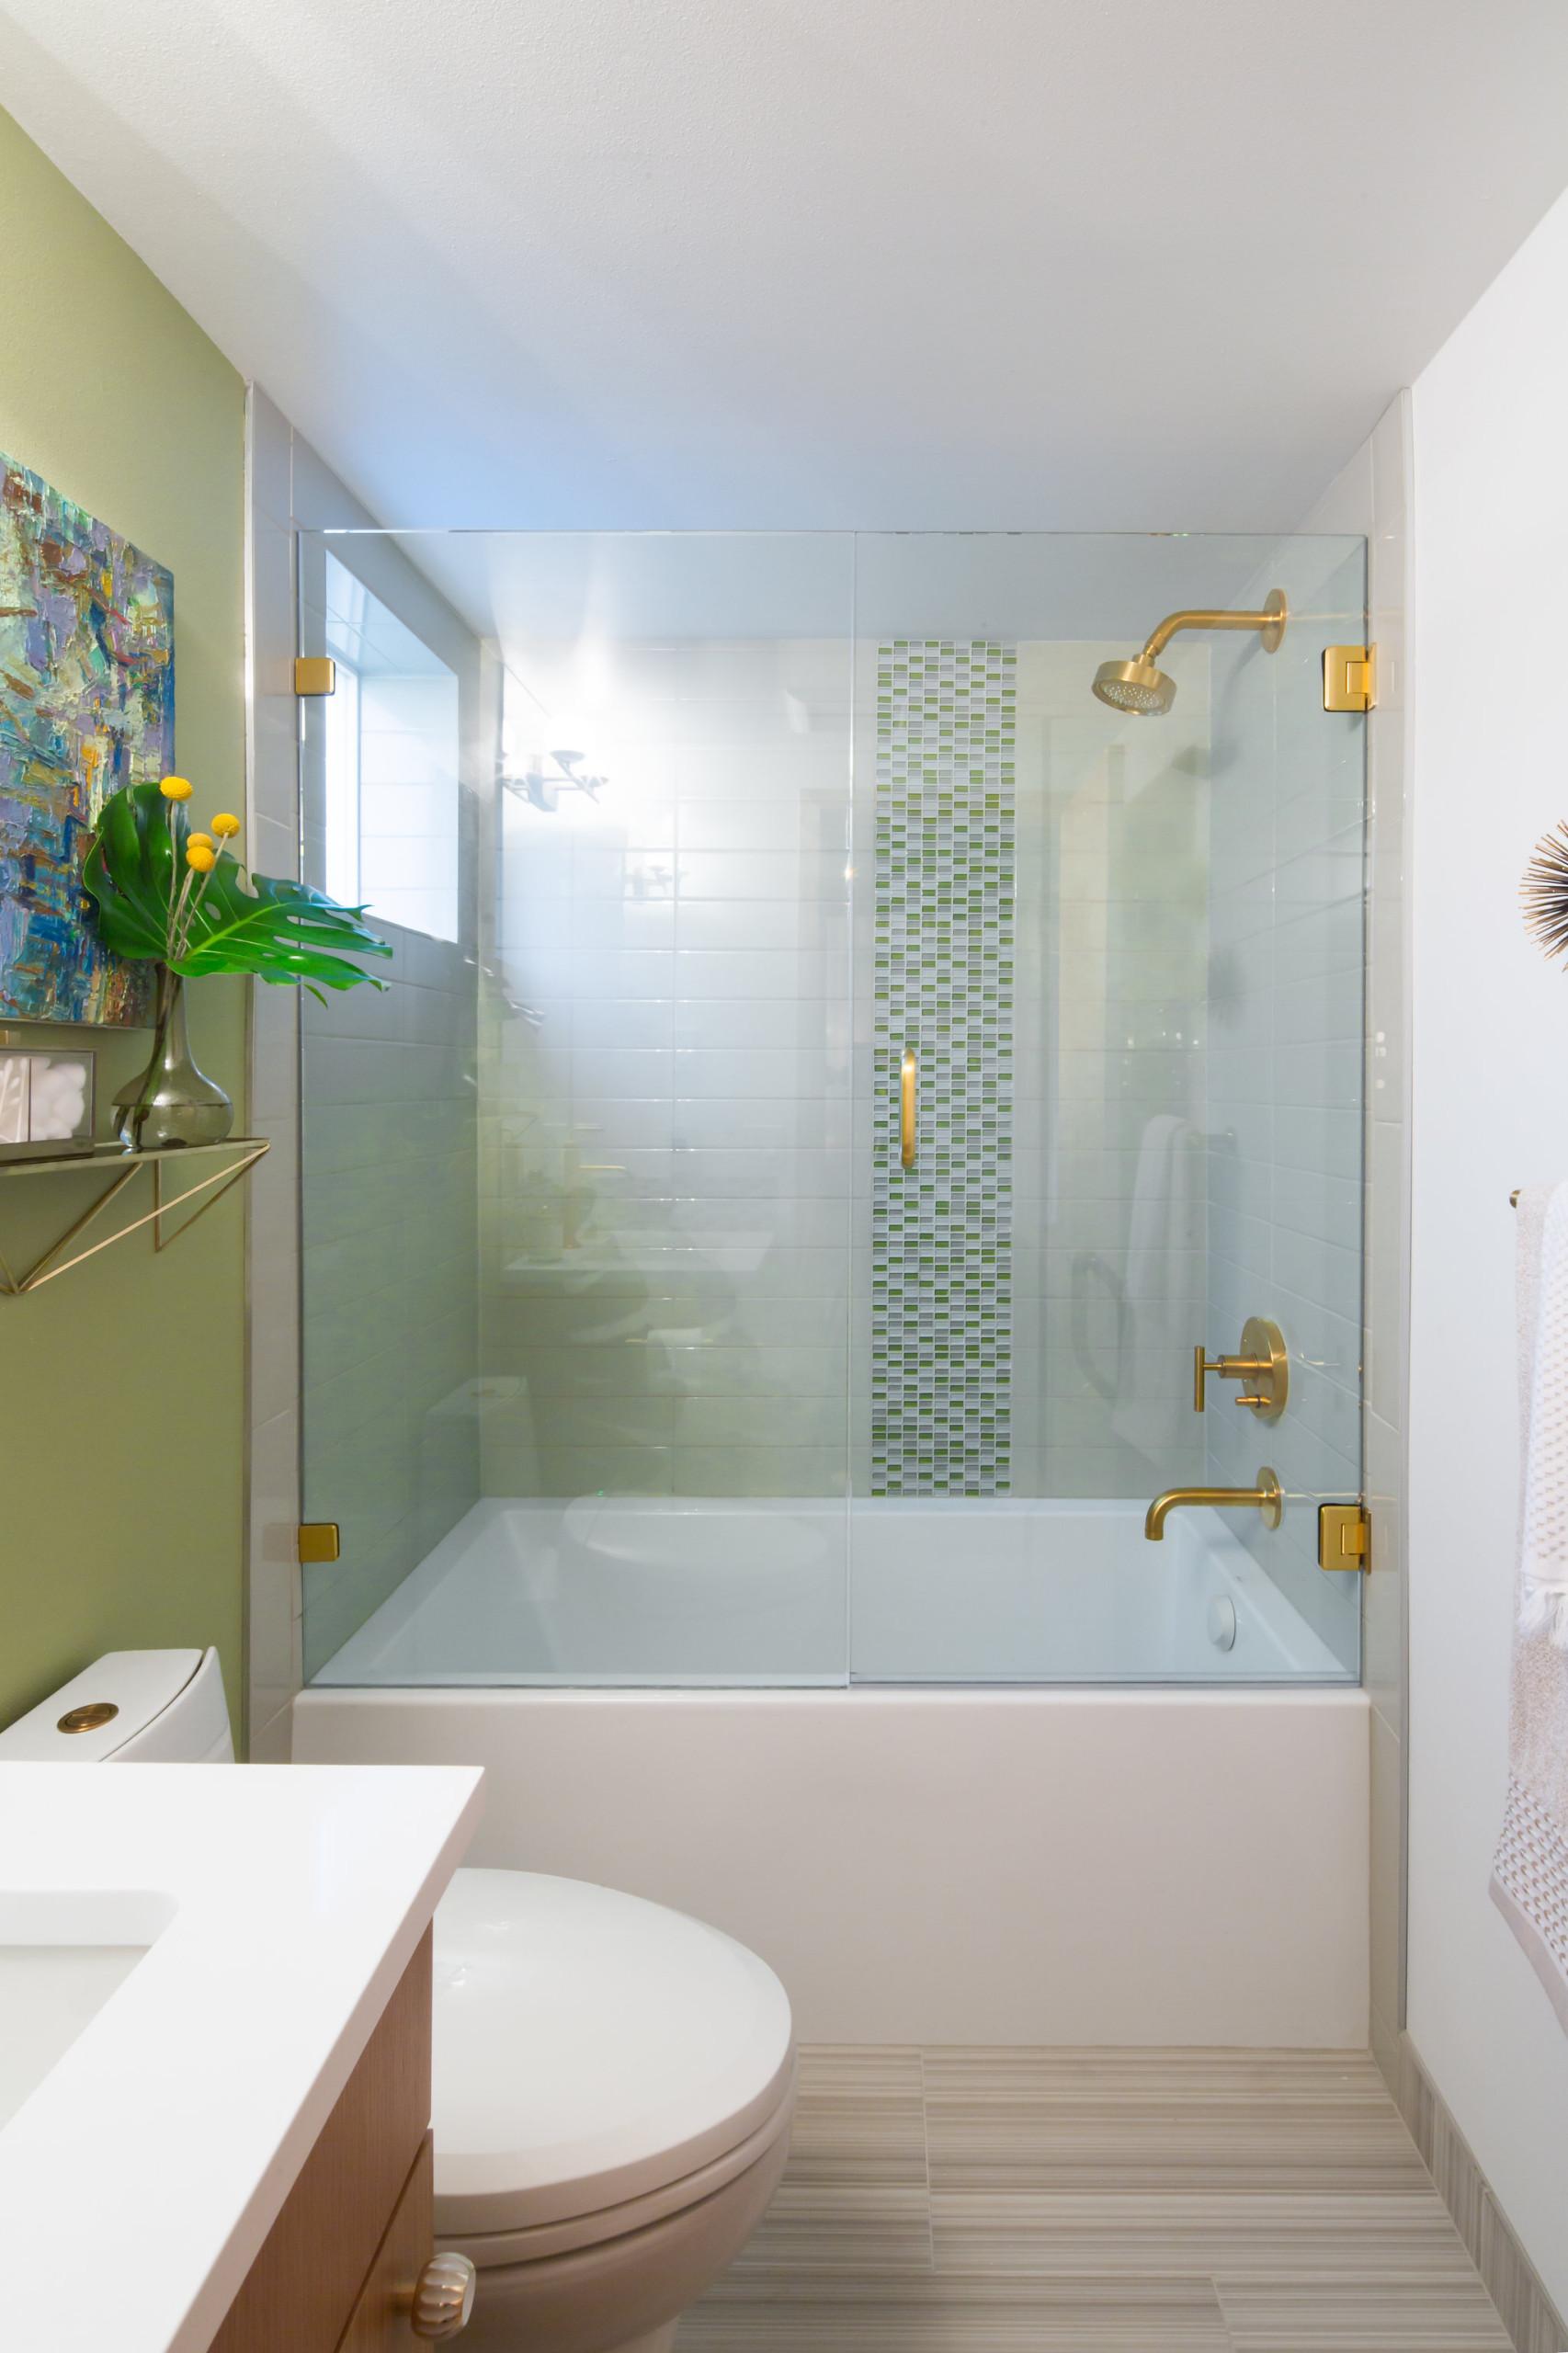 75 Beautiful Glass Tile Bathroom Pictures Ideas April 2021 Houzz